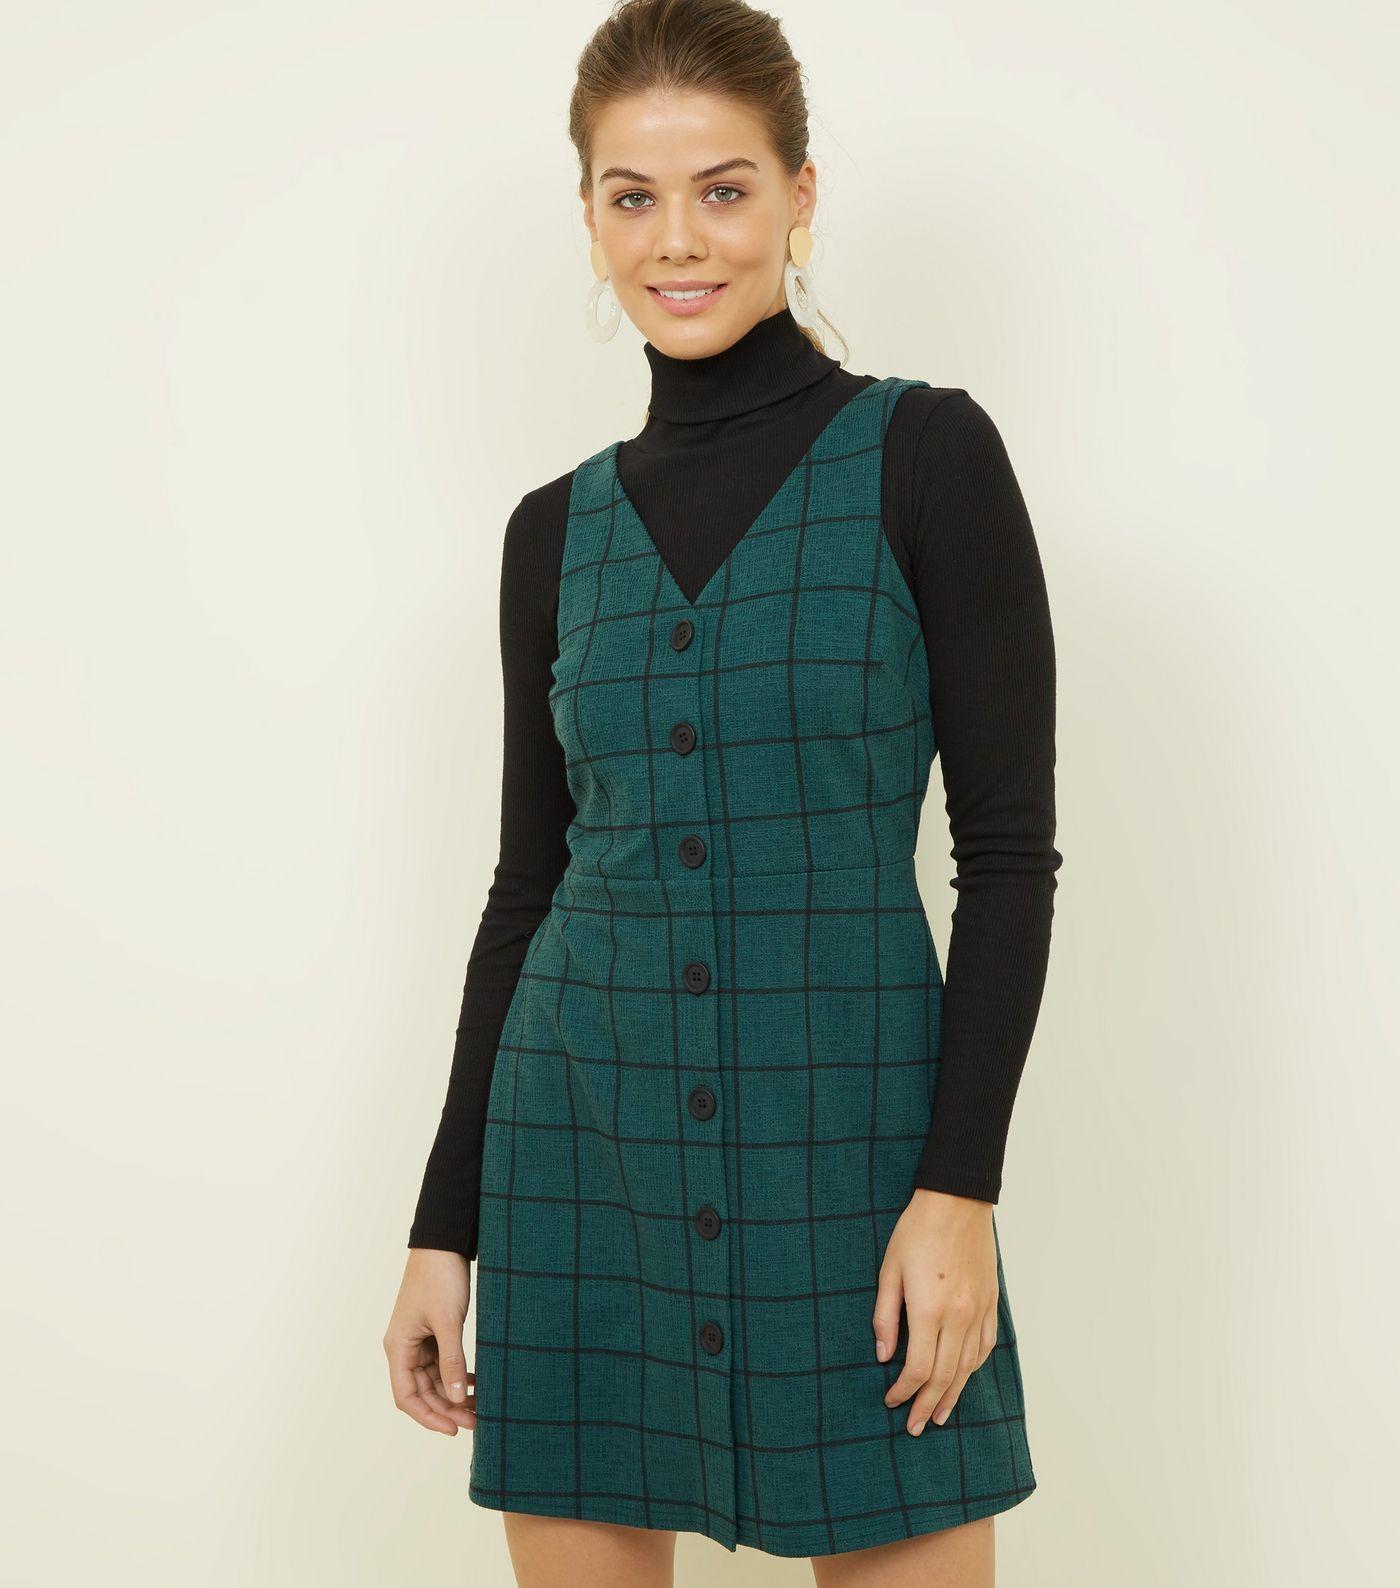 e4a6a692d0 Dark Green Grid Check Button Through Pinafore Dress